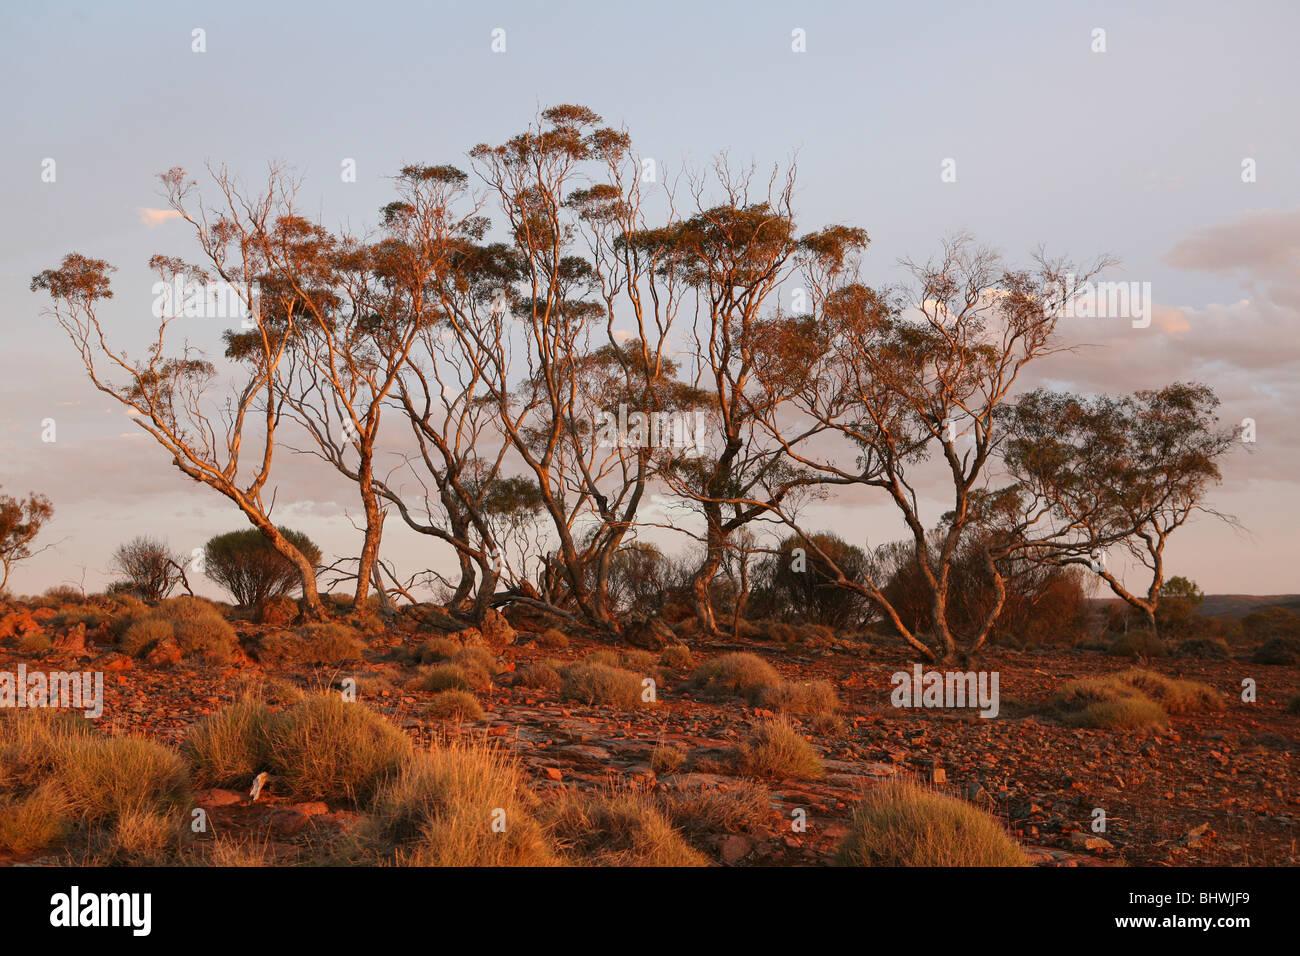 australasian nature photography 09 south australian museum